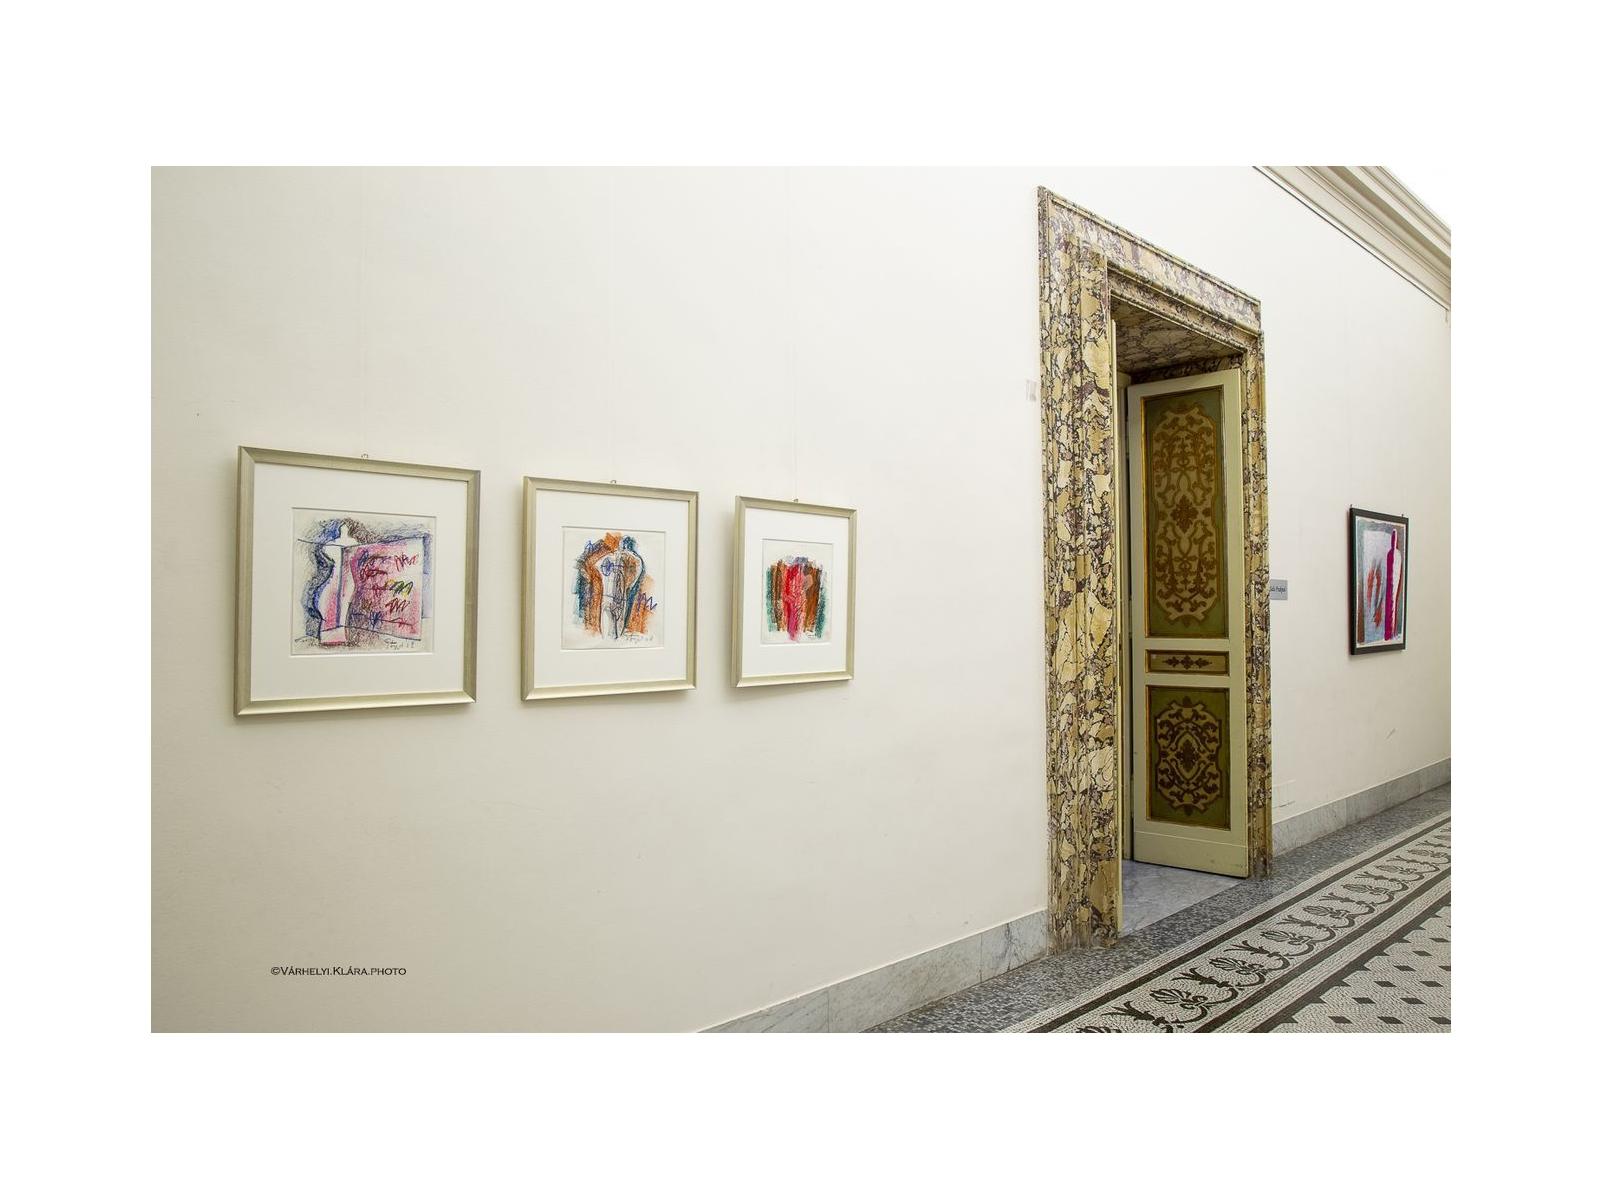 Karl-Stengel.-Con-cuore-puro.-Exhibition-view-at-Accademia-dUngheria-Roma-2020.-Photo-Klára-Várhelyi-_4_